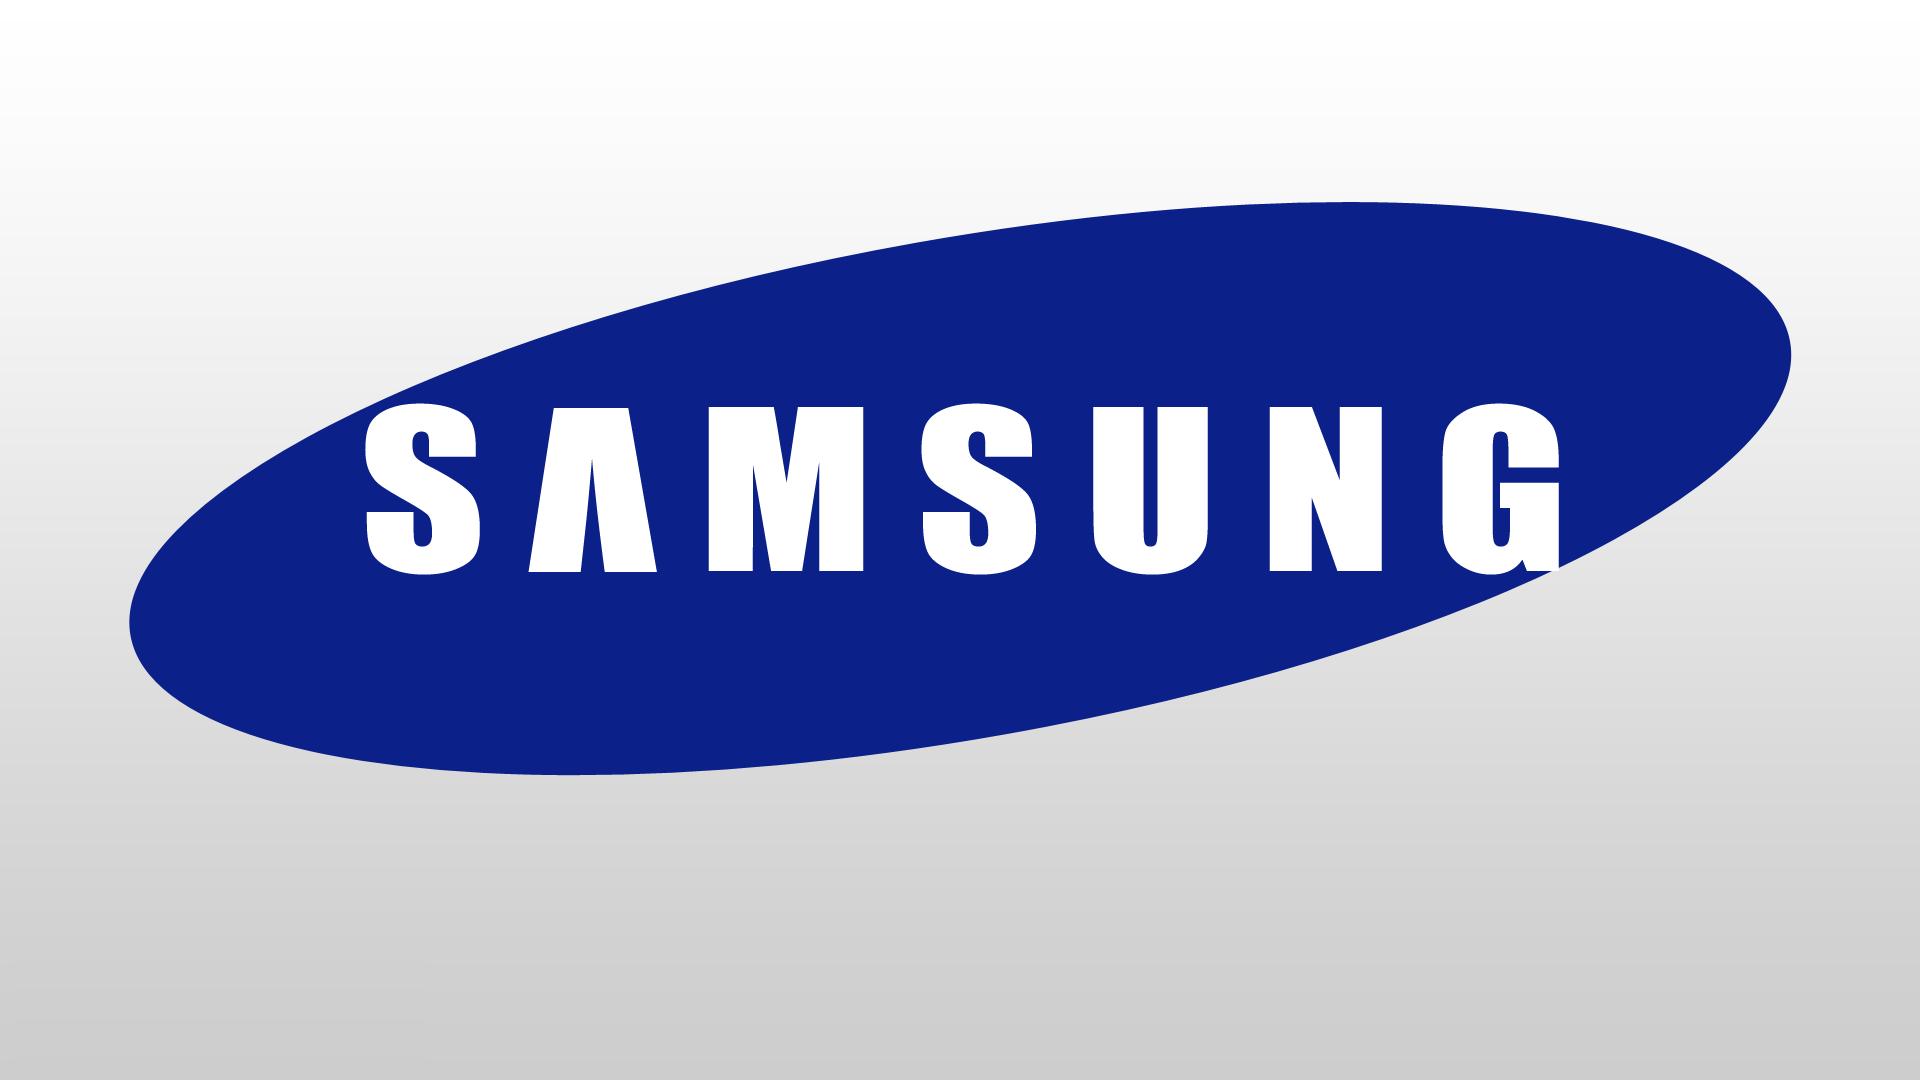 Samsung-Logo-HD-Wallpapers